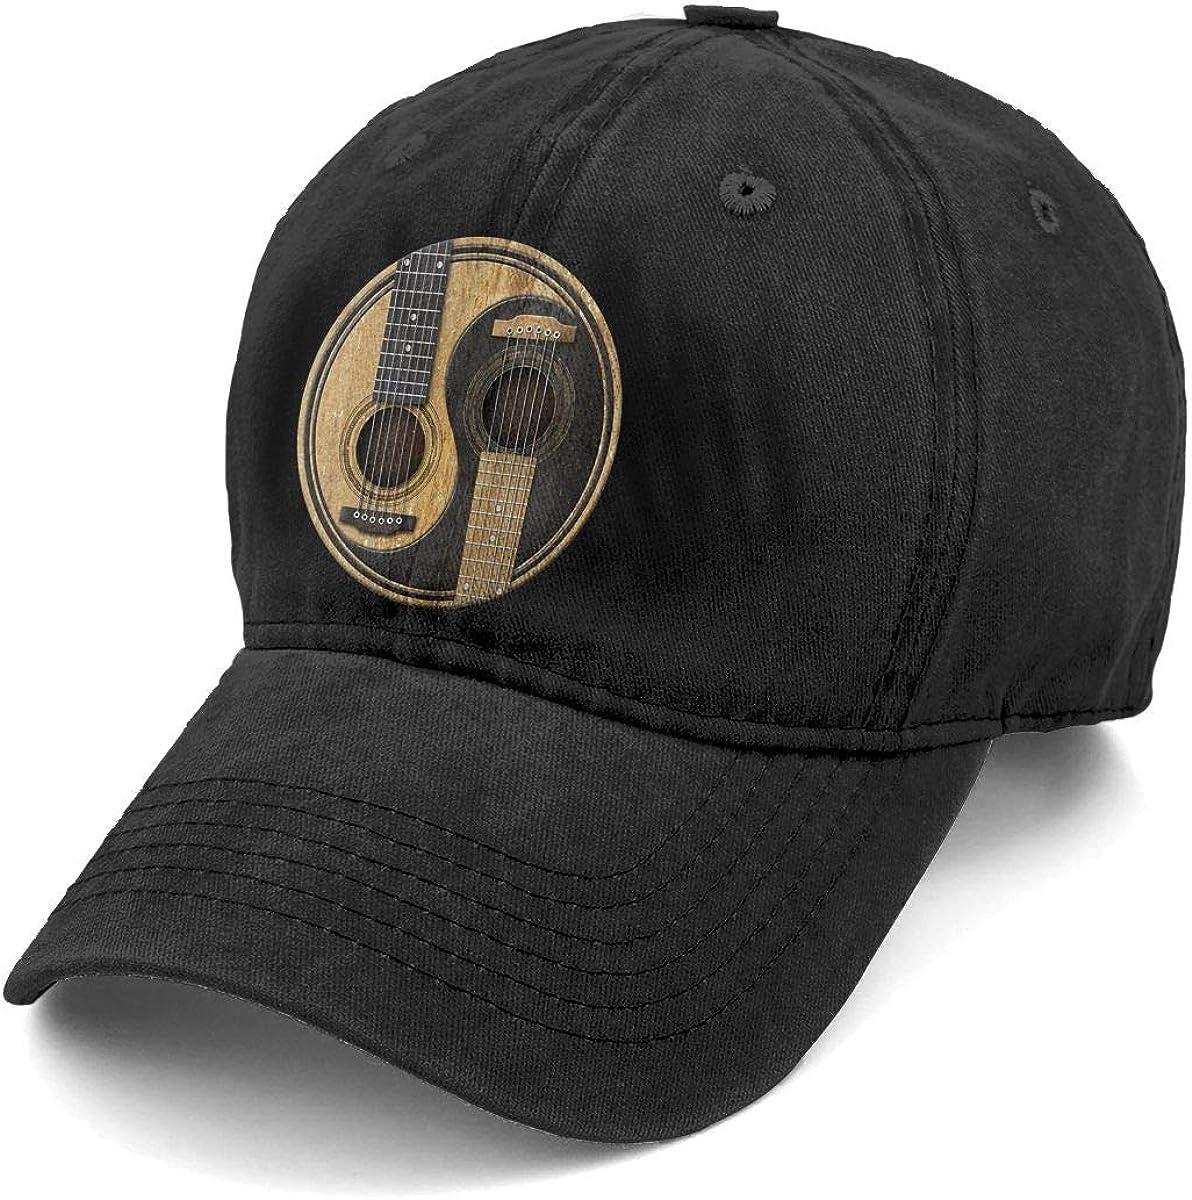 Unisex Old and Worn Acoustic Guitars Yin Yang Denim Hat Adjustable Washed Dyed Cotton Dad Baseball Caps: Clothing